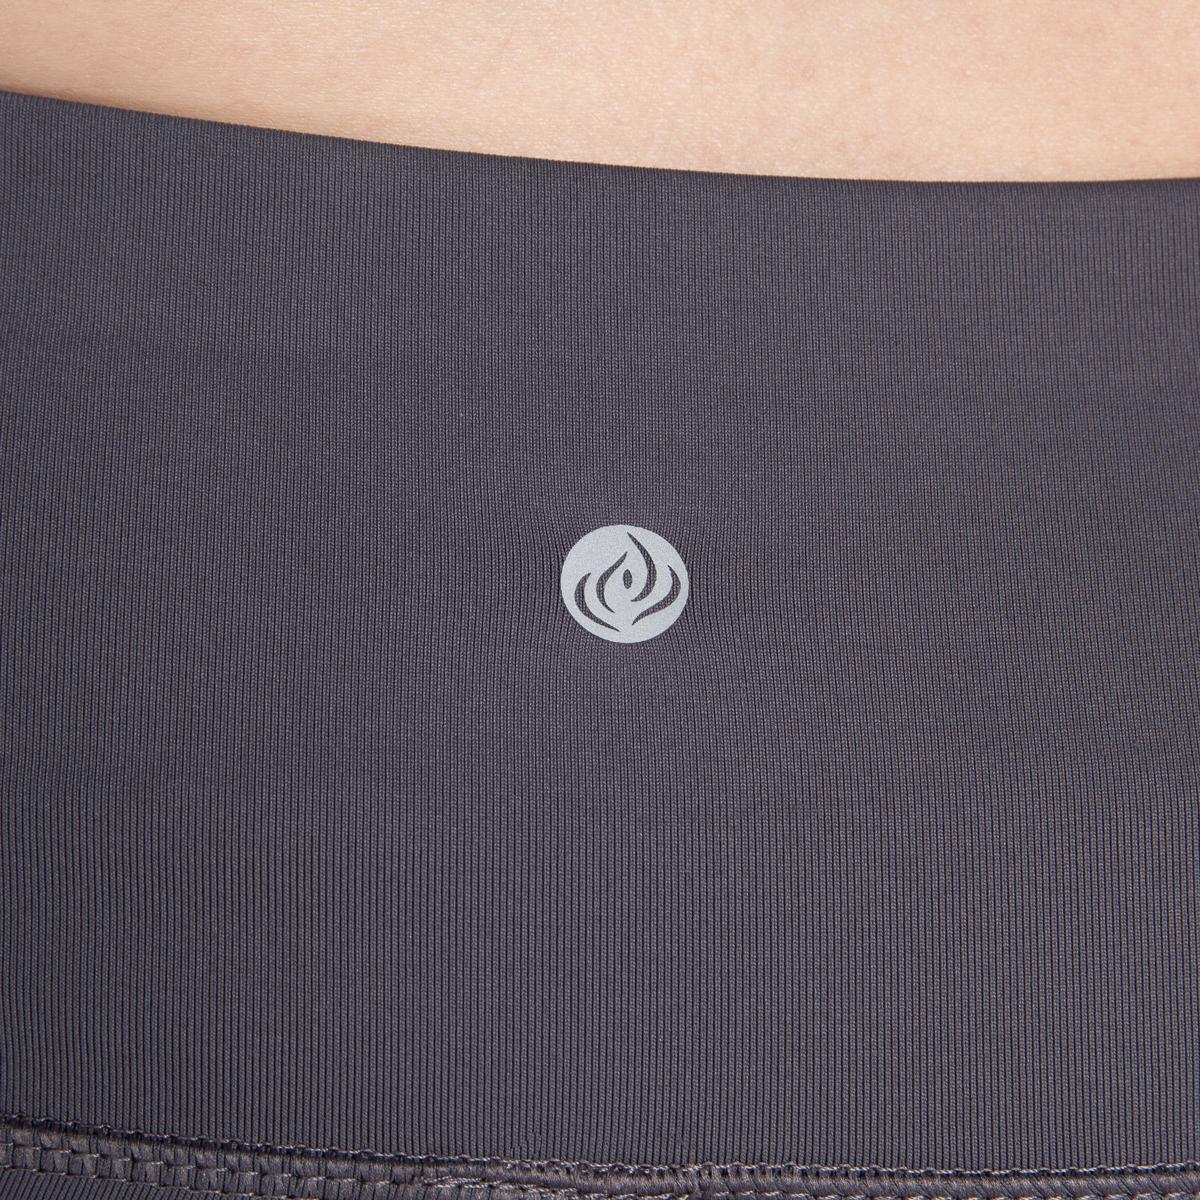 7-8-Length-High-Waist-Moisture-Wicking-UPF-50-Leggings-Run-Gym-Yoga-Pants-Mesh thumbnail 13